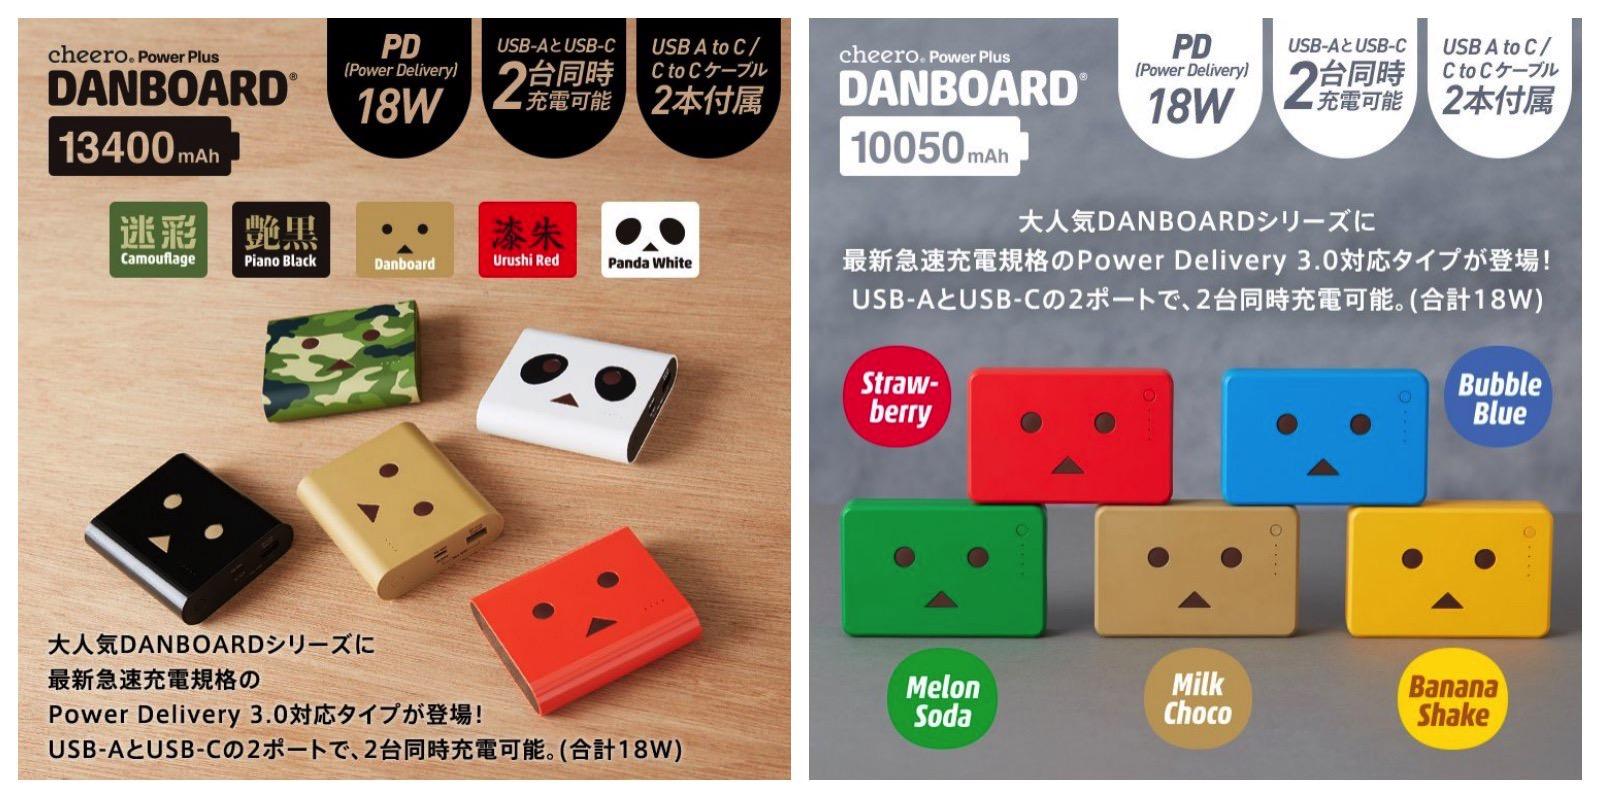 Cheero-New-Danboard-Series.jpg